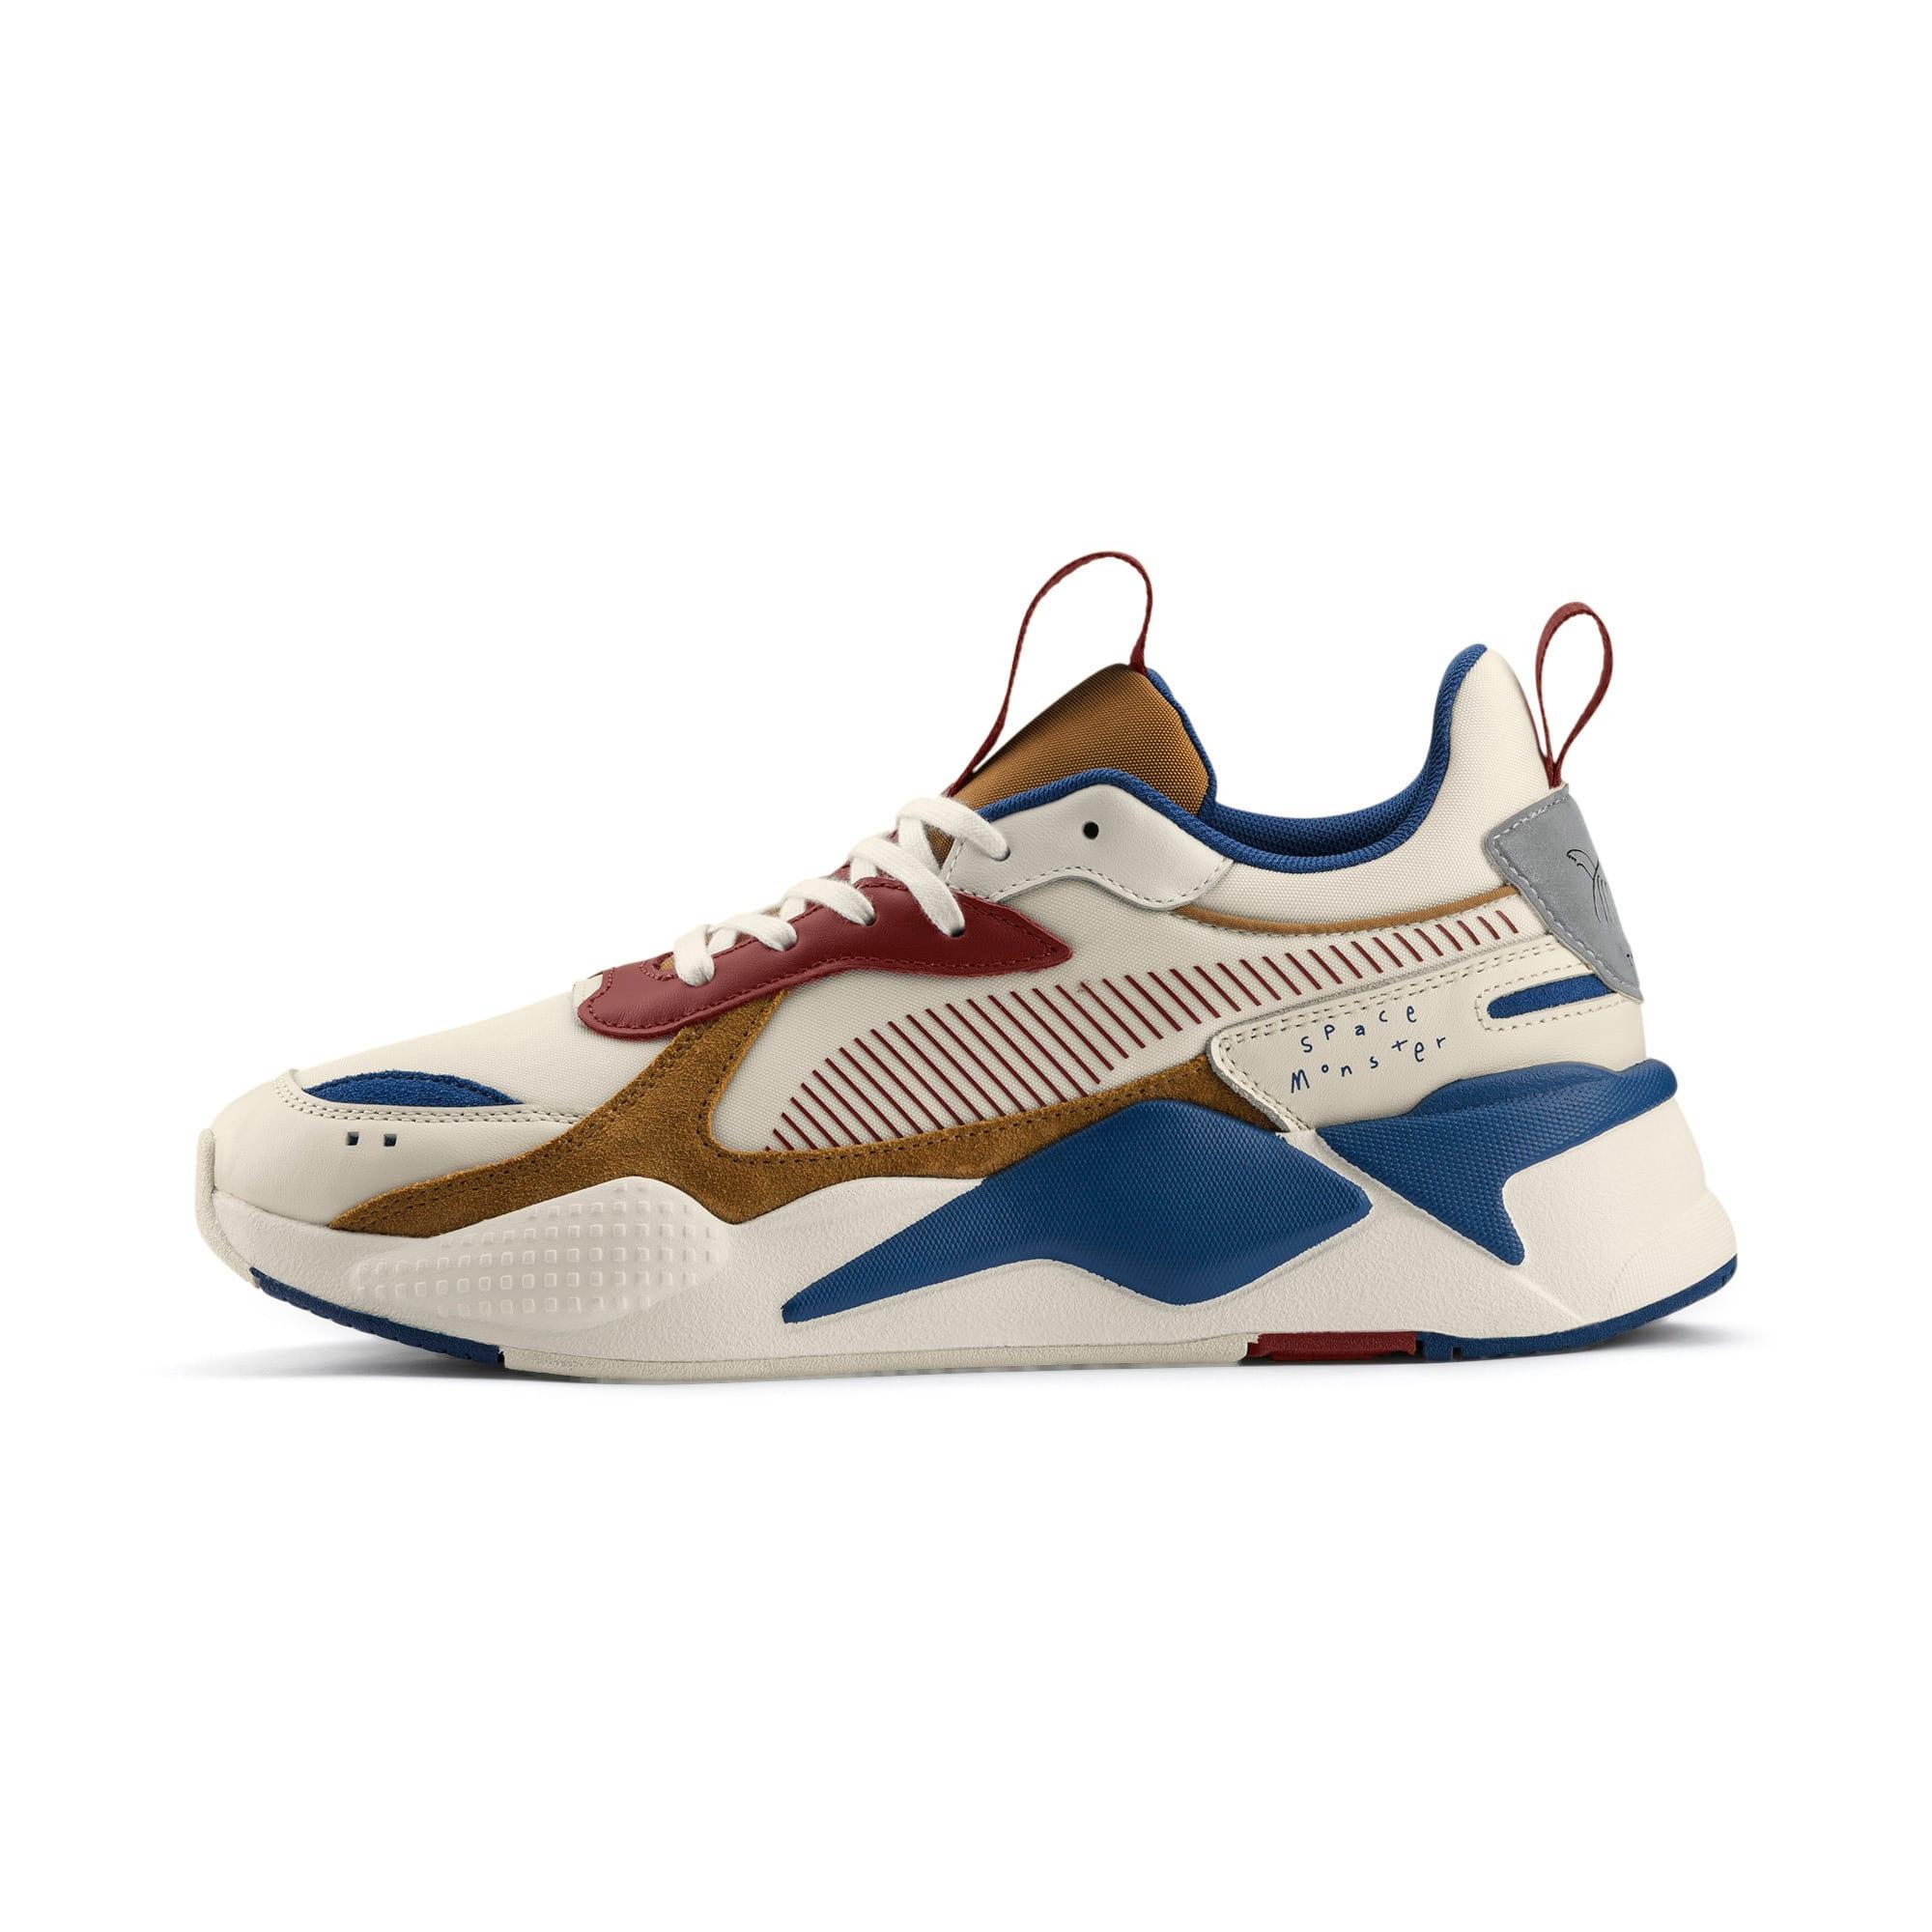 Miniatura 1 de Zapatos deportivos PUMA x TYAKASHA RS-X, Whisper White-Fired Brick, mediano